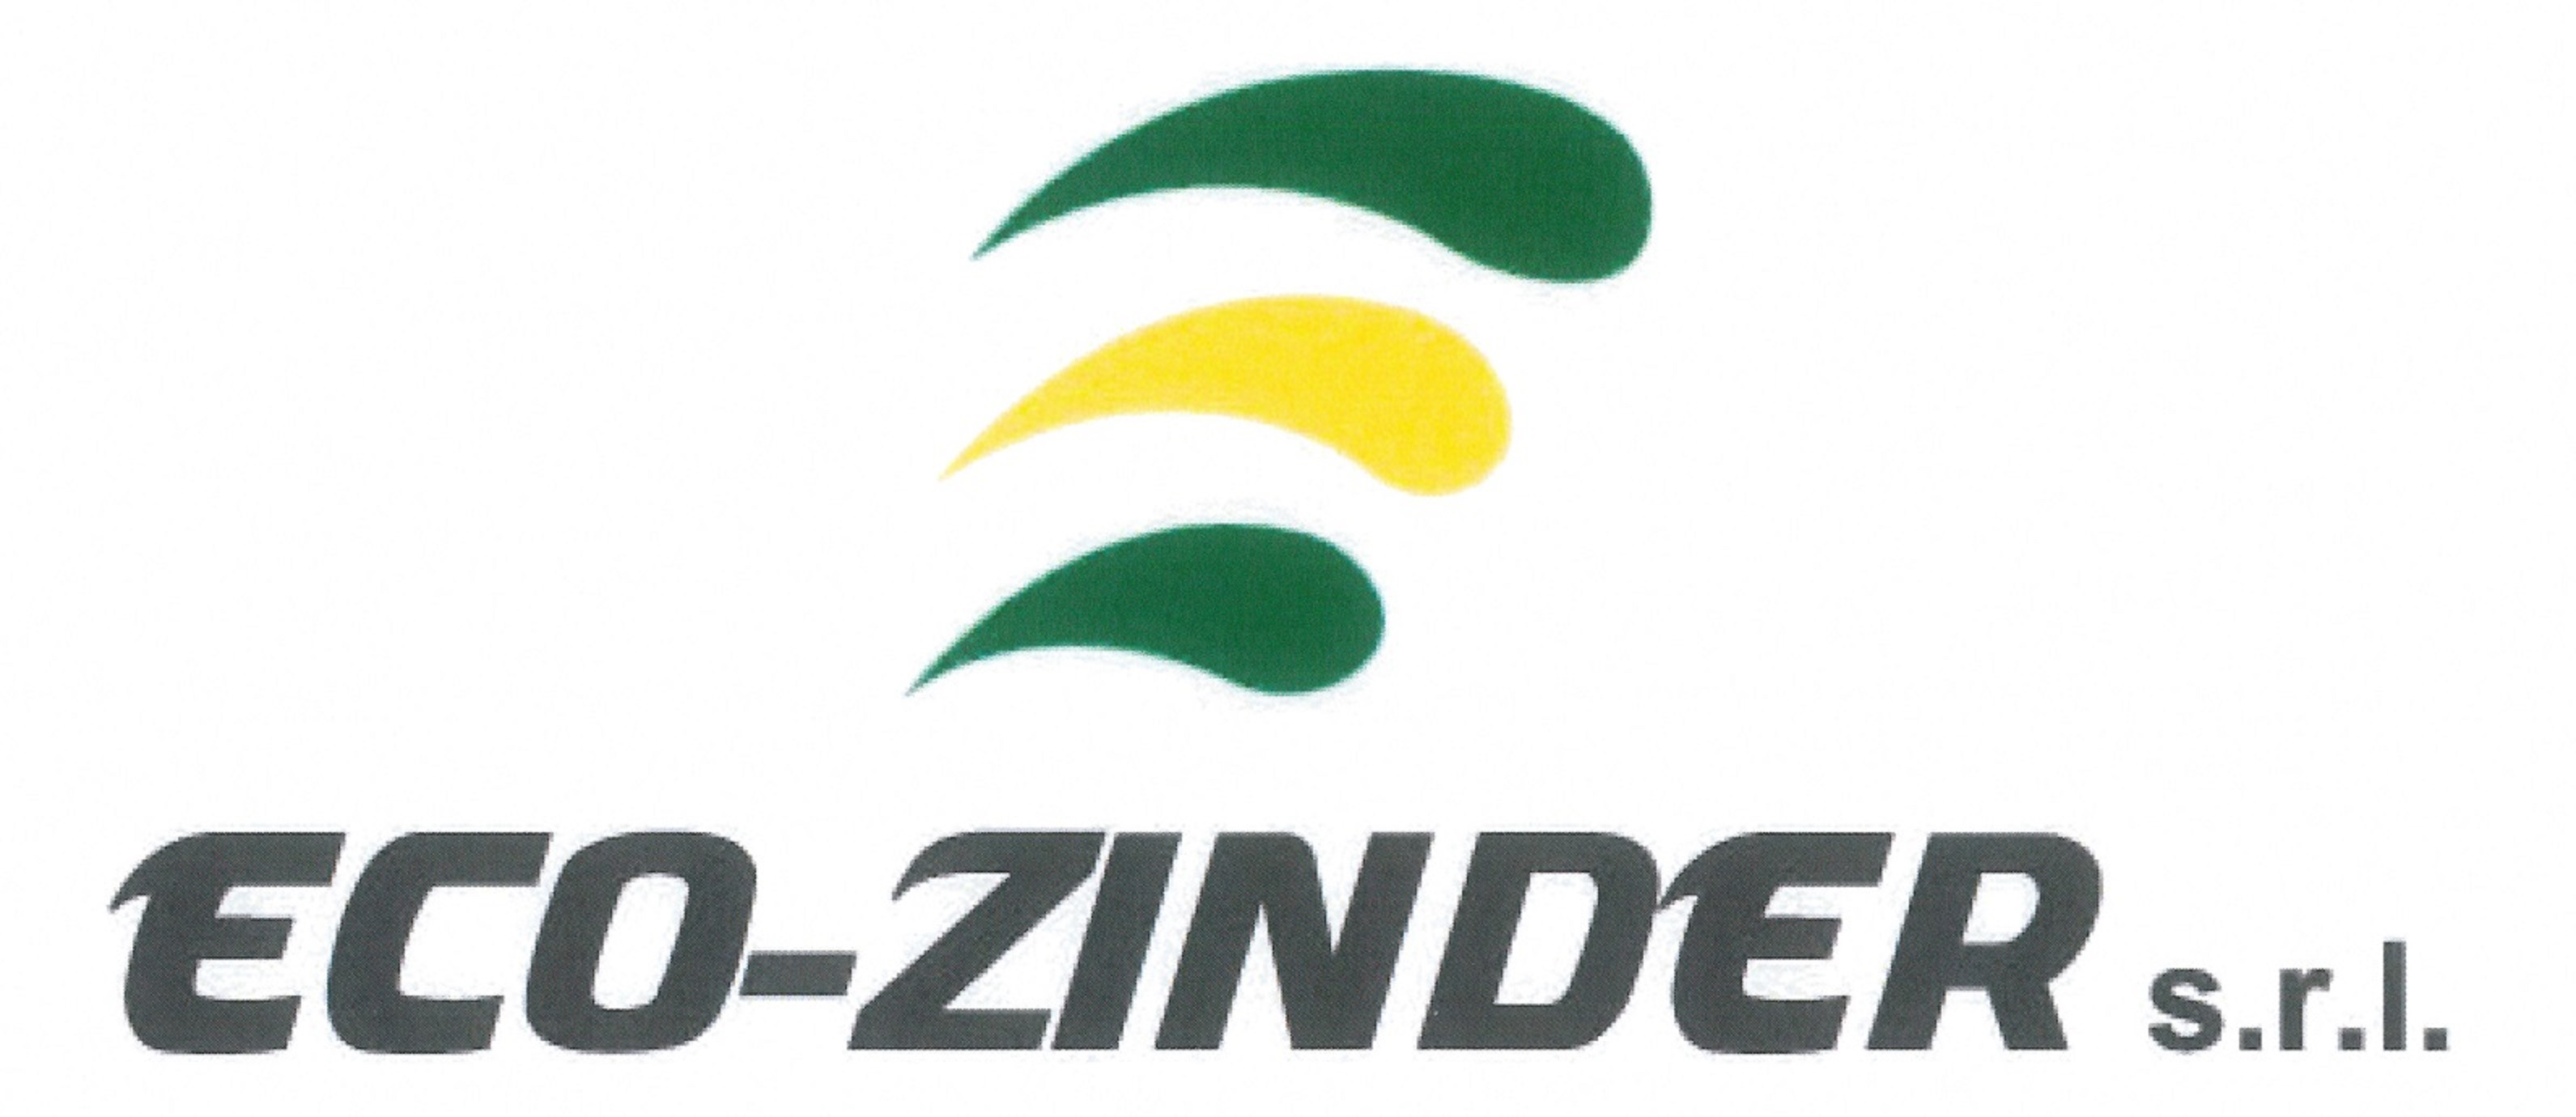 eco-zinder-srl